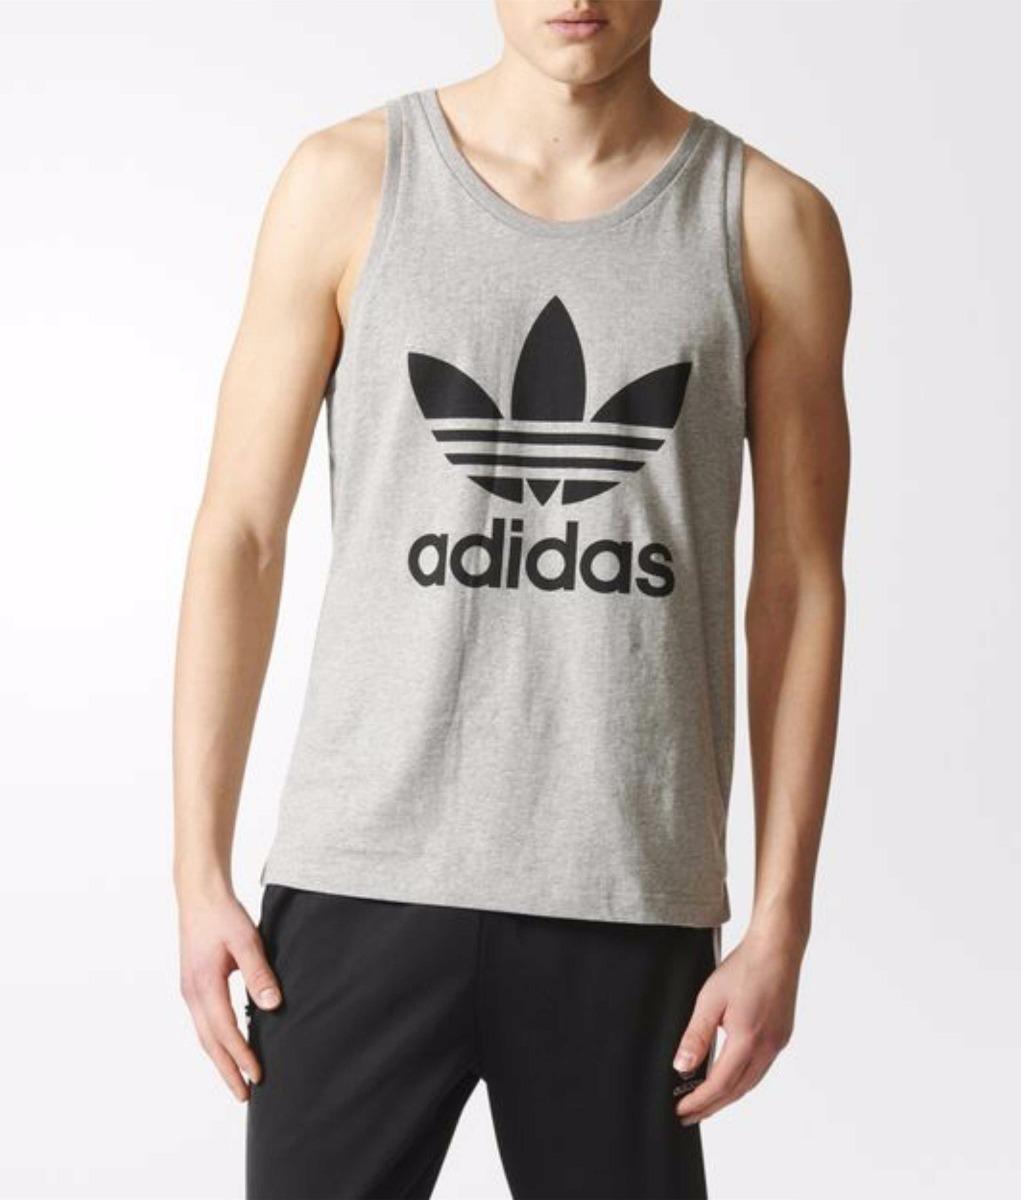 camiseta regata masculina camiseta regata cavada logo adidas. Carregando  zoom. 6b8aad63f11